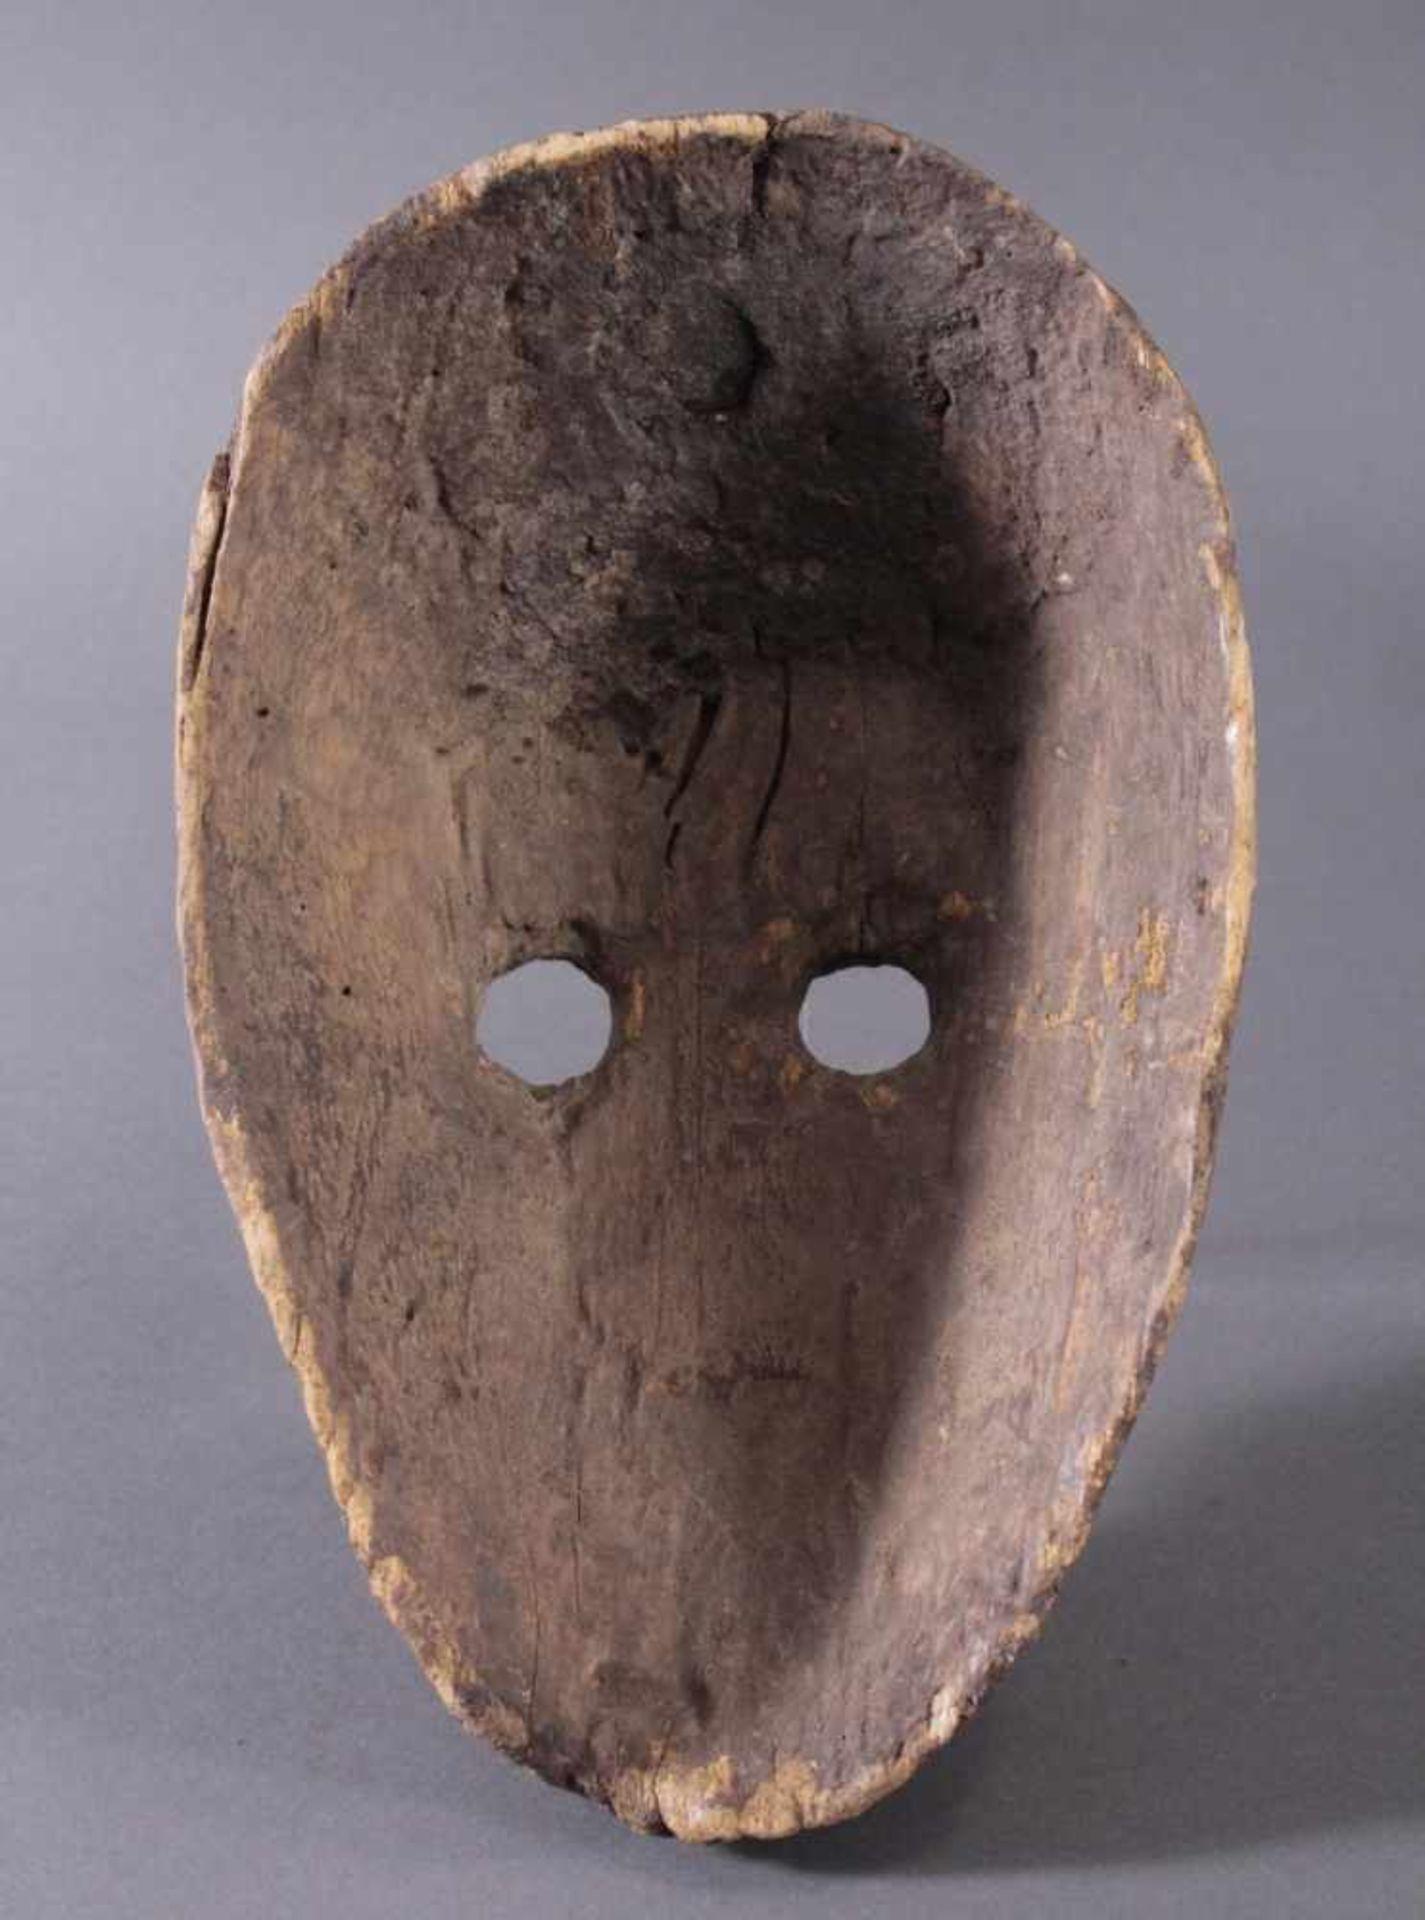 Antike Zoomorphe Maske, Makua, Tansania 1. Hälfte 20. Jh.Hartholzolz, alter Wurmfrass, dunkle Patina - Bild 6 aus 6